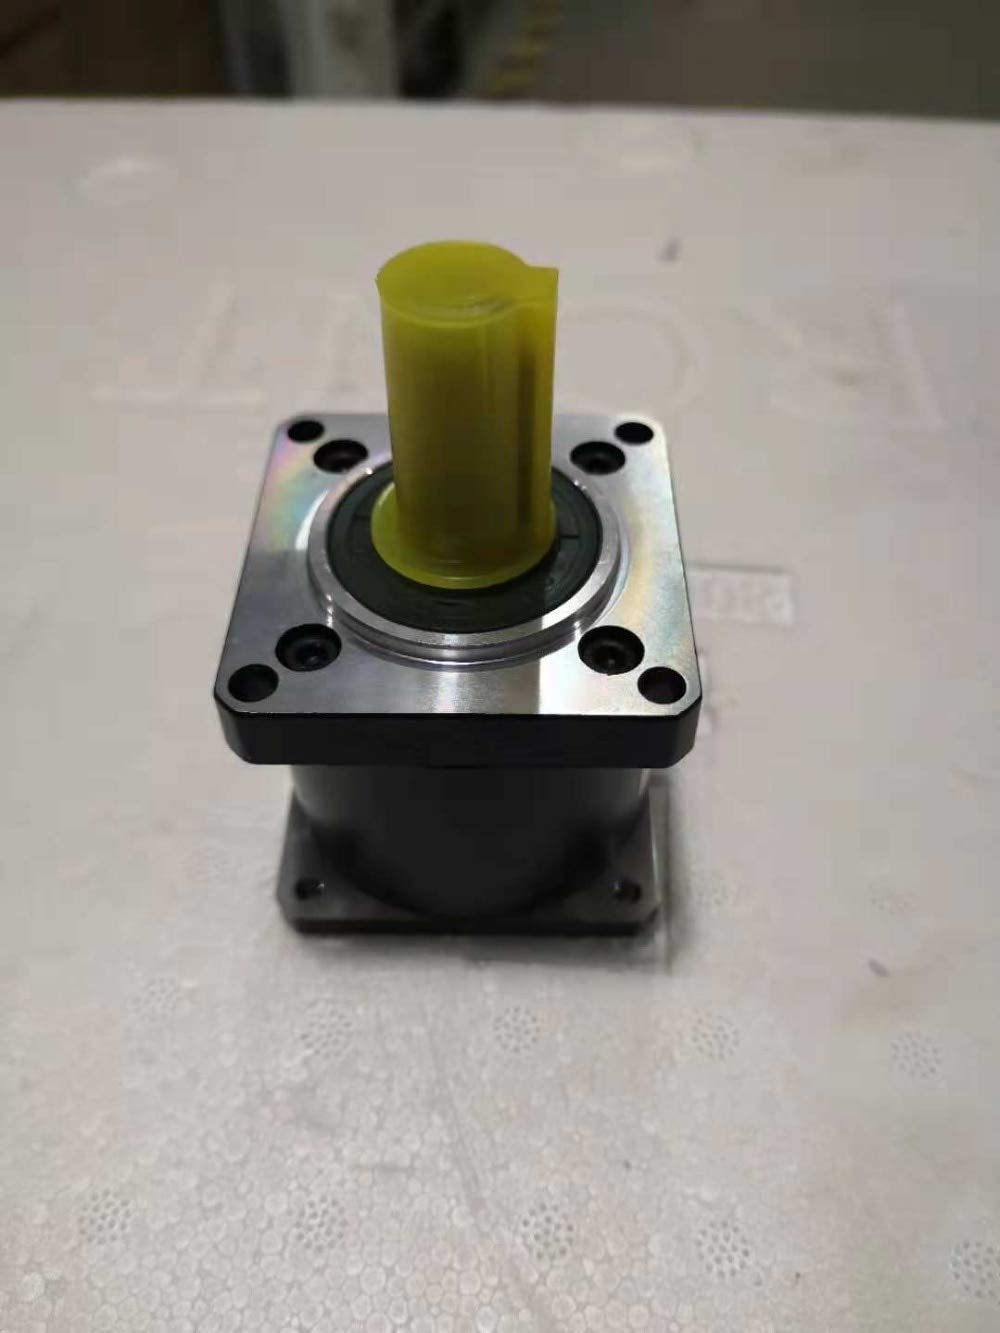 Fevas NEMA23 Precision Type Planetary Gearbox Geared Speed Reducer Body Length 53mm Gear Ratio 5:1